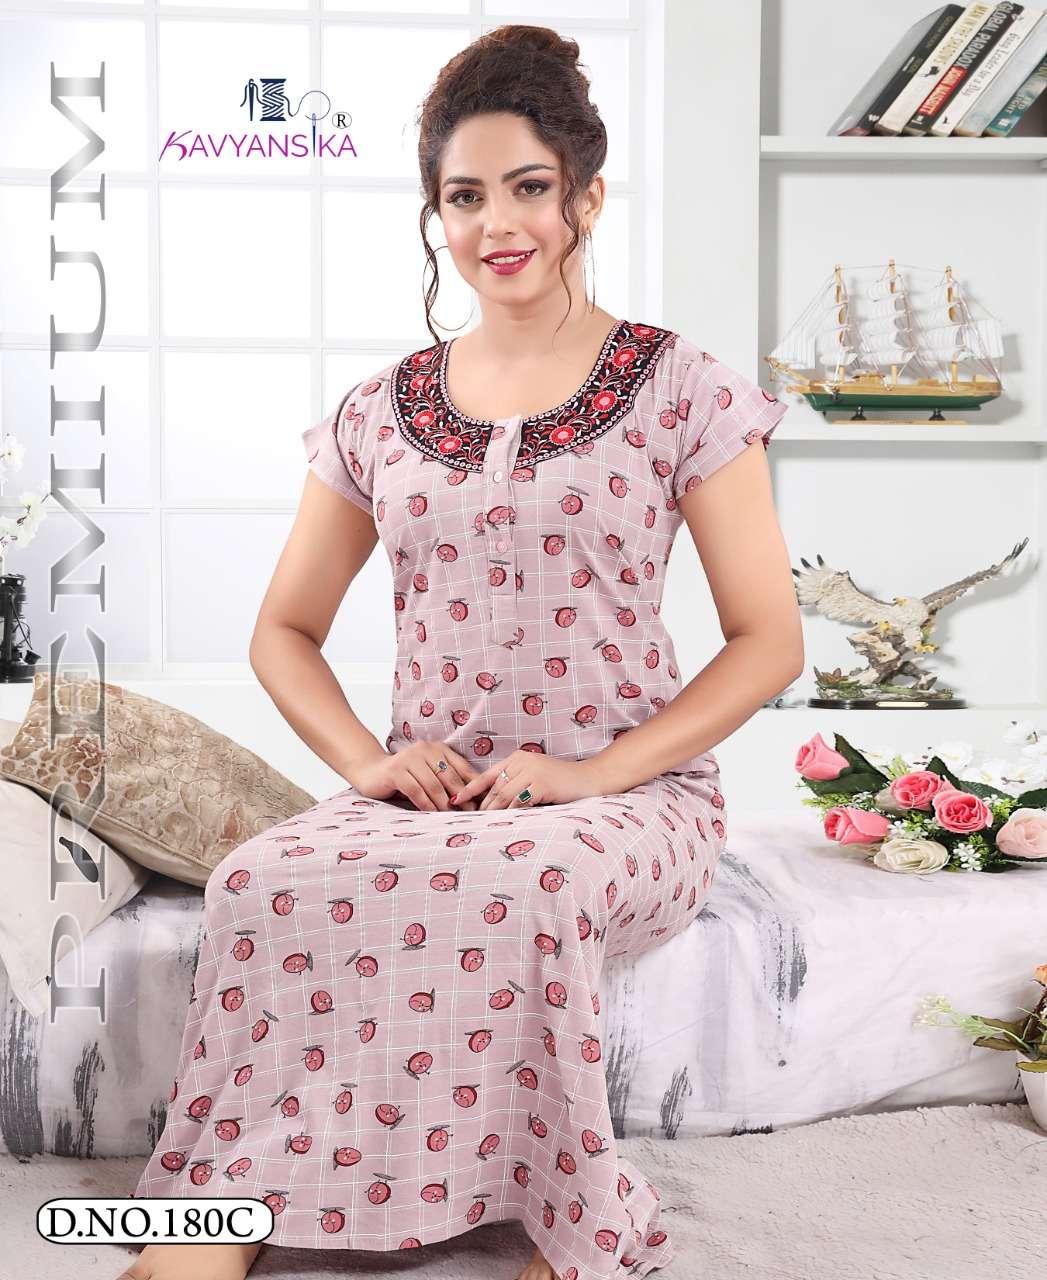 Kavyansika Premium Vol 180 Hosiery Night Gown Collection